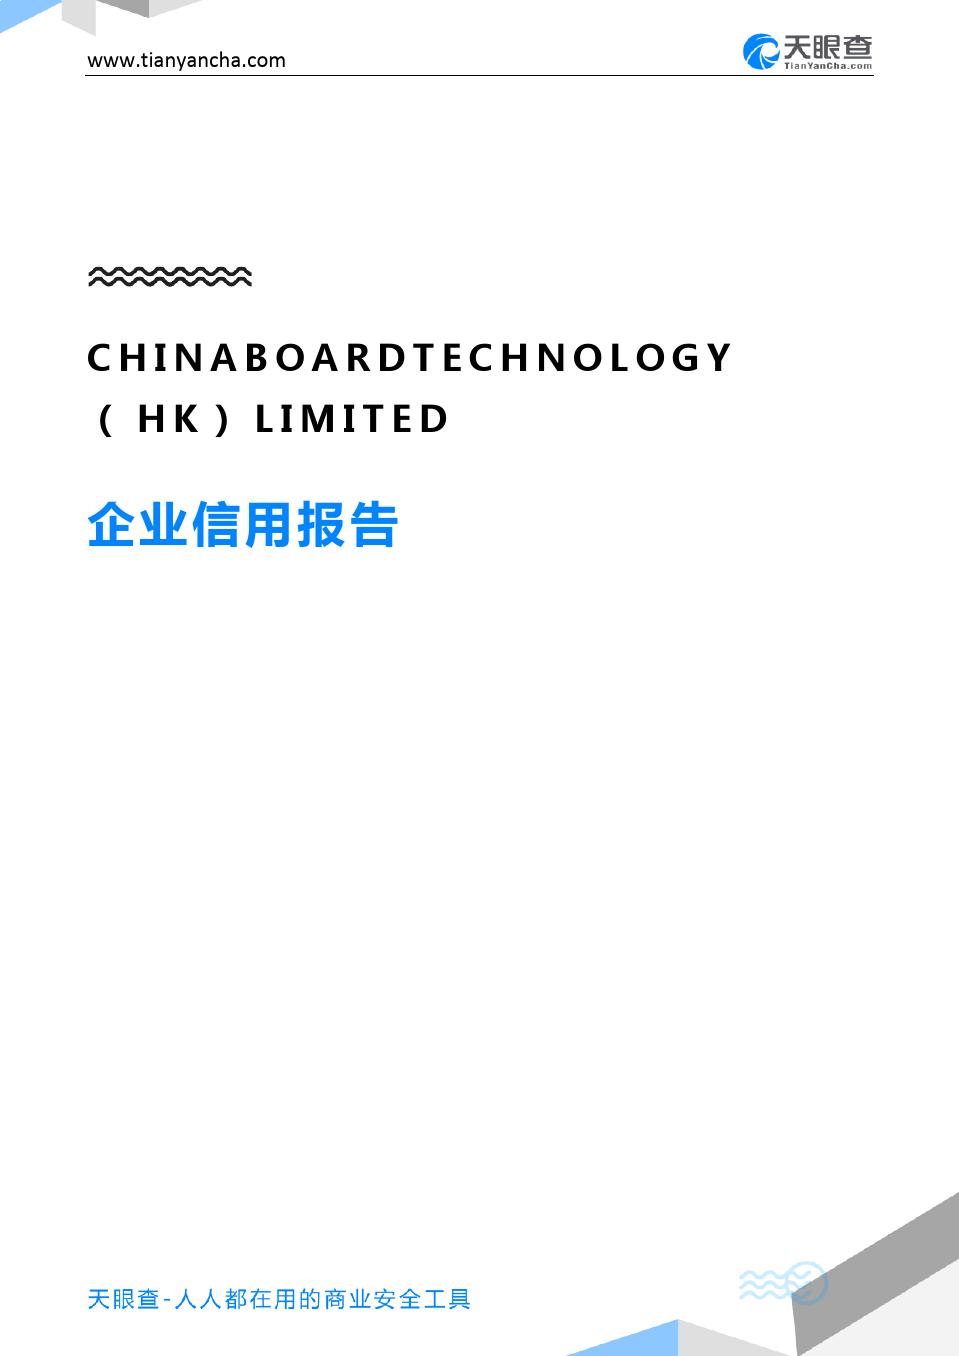 CHINABOARDTECHNOLOGY(HK)LIMITED企业信用报告-天眼查